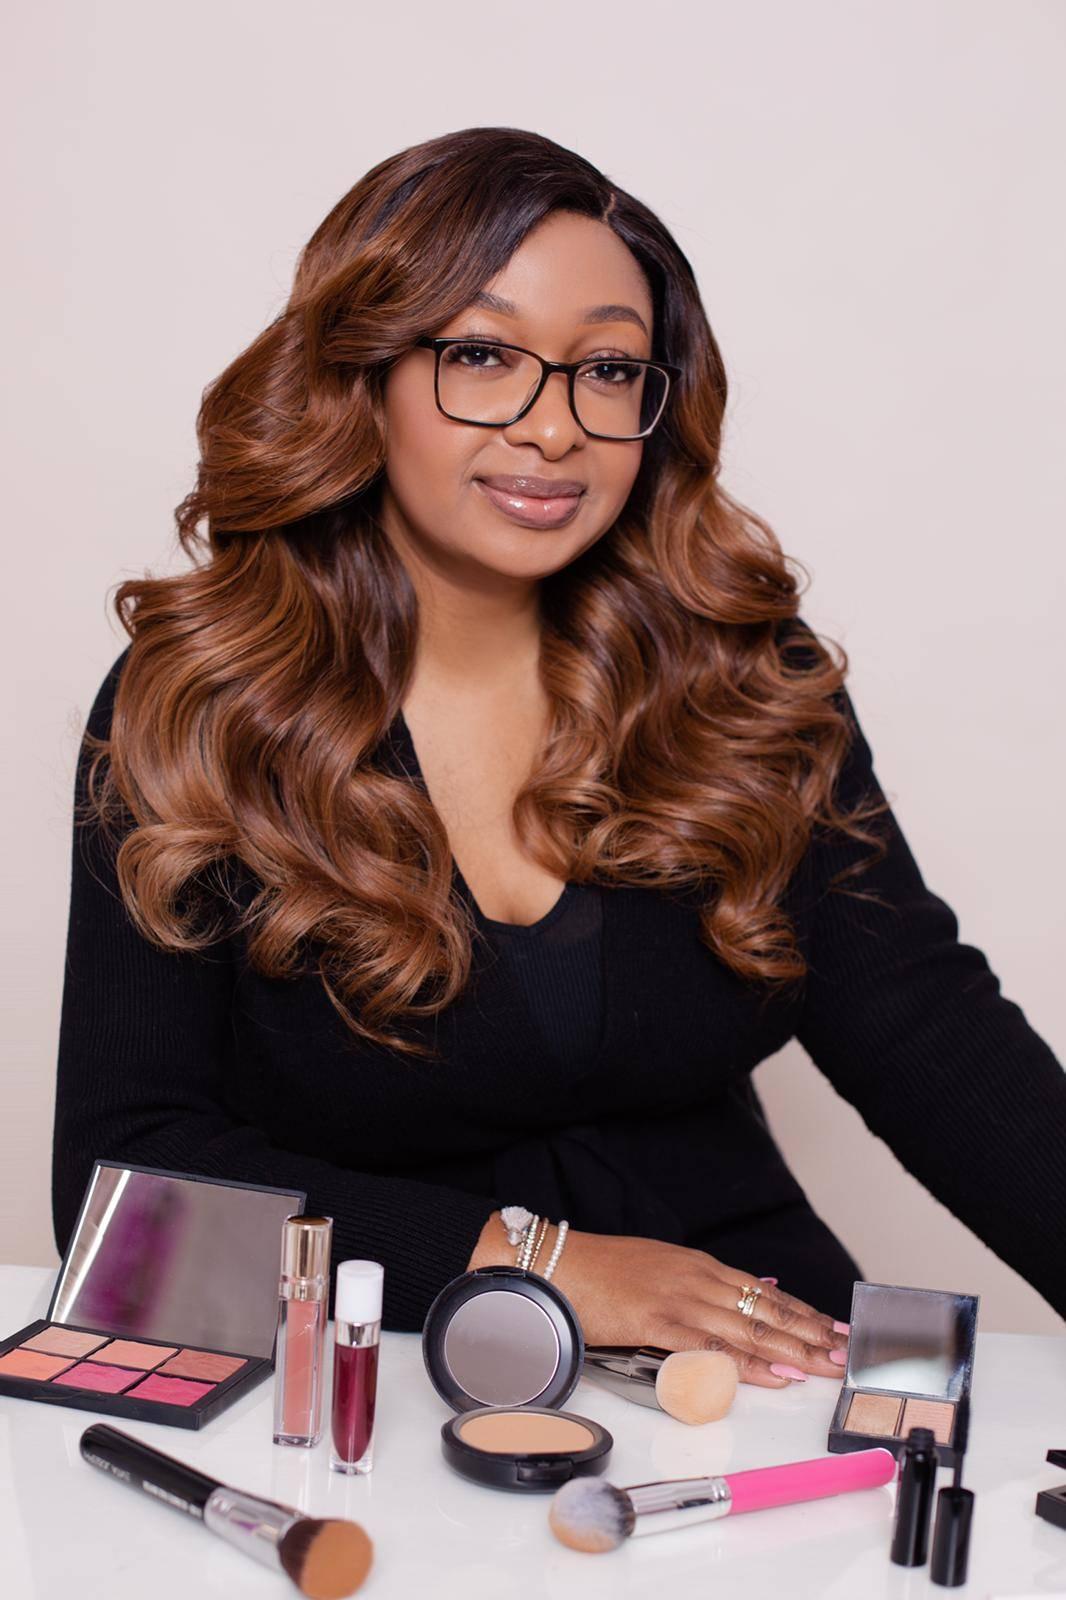 What's In A Celebrity Makeup Artist's Makeup Bag? - blacknet